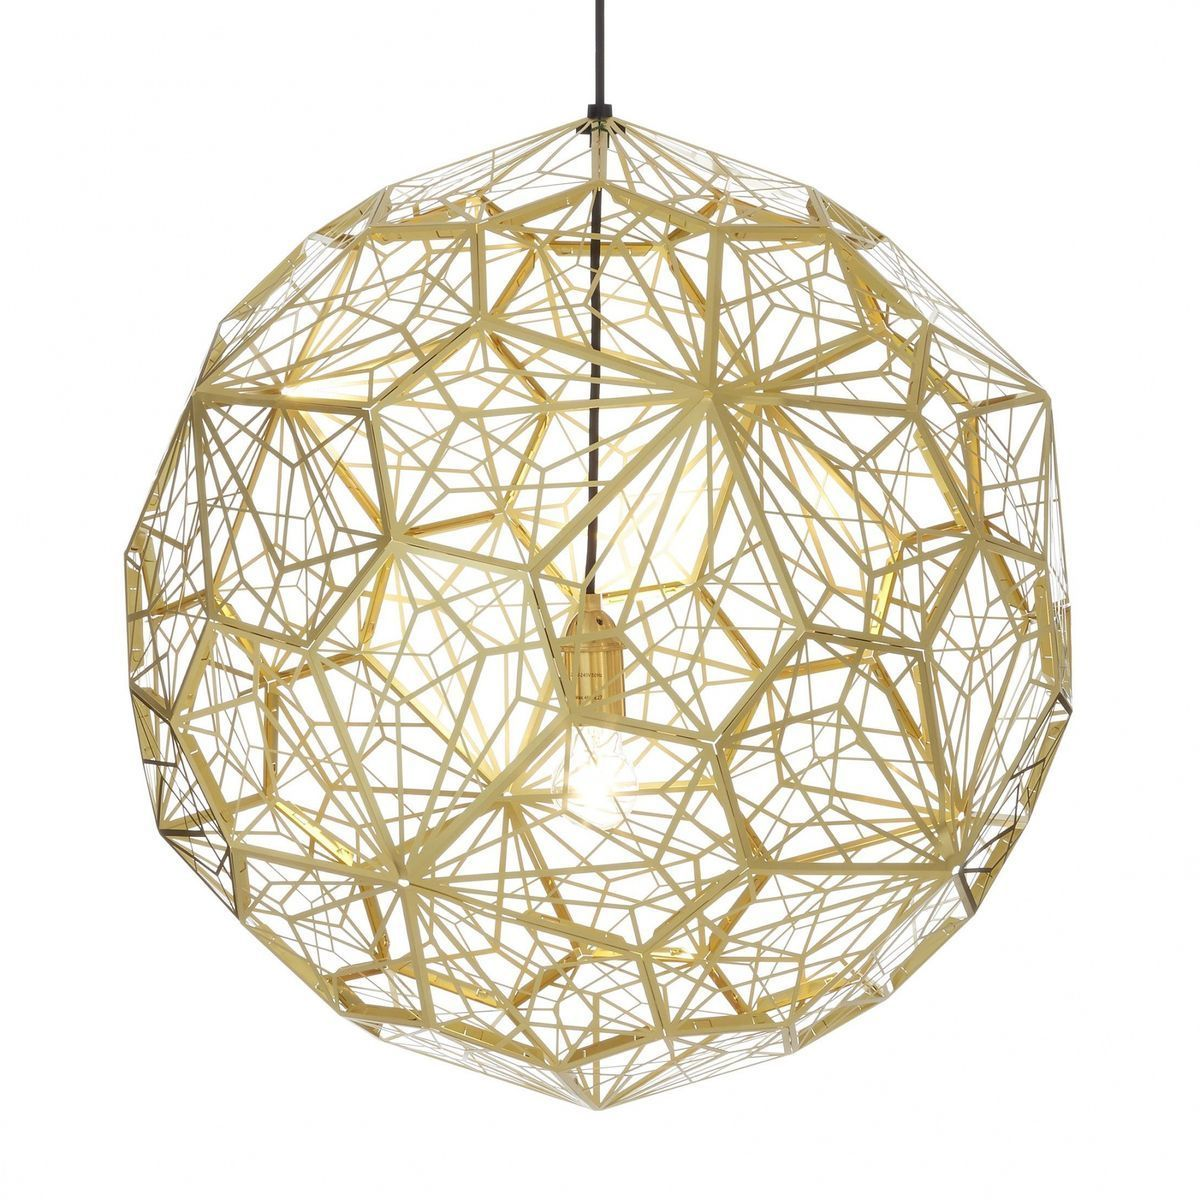 Etch Light Web Suspension Lamp